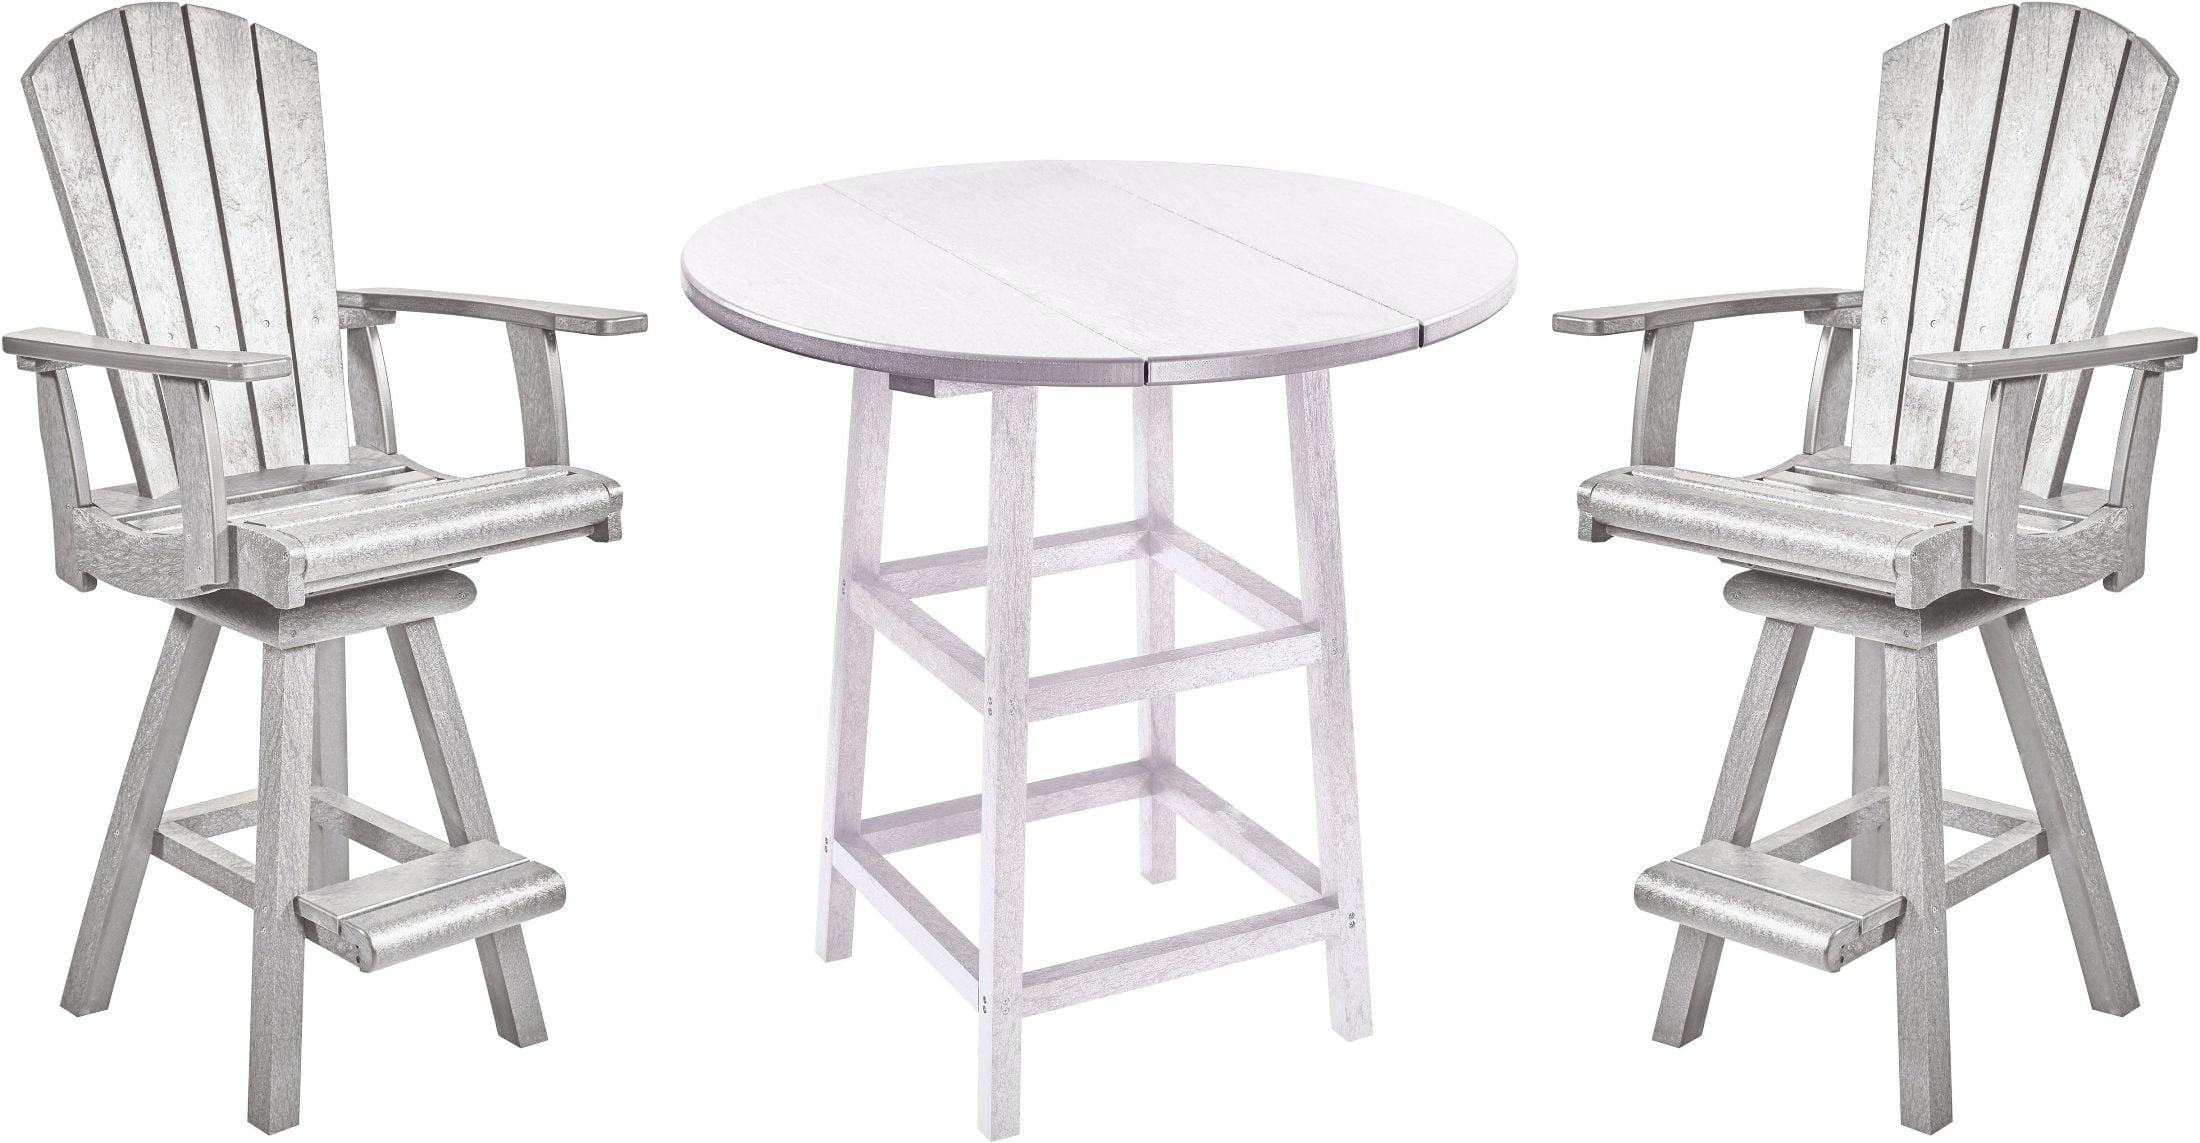 generation white 32 round pub table set from cr plastic coleman furniture. Black Bedroom Furniture Sets. Home Design Ideas